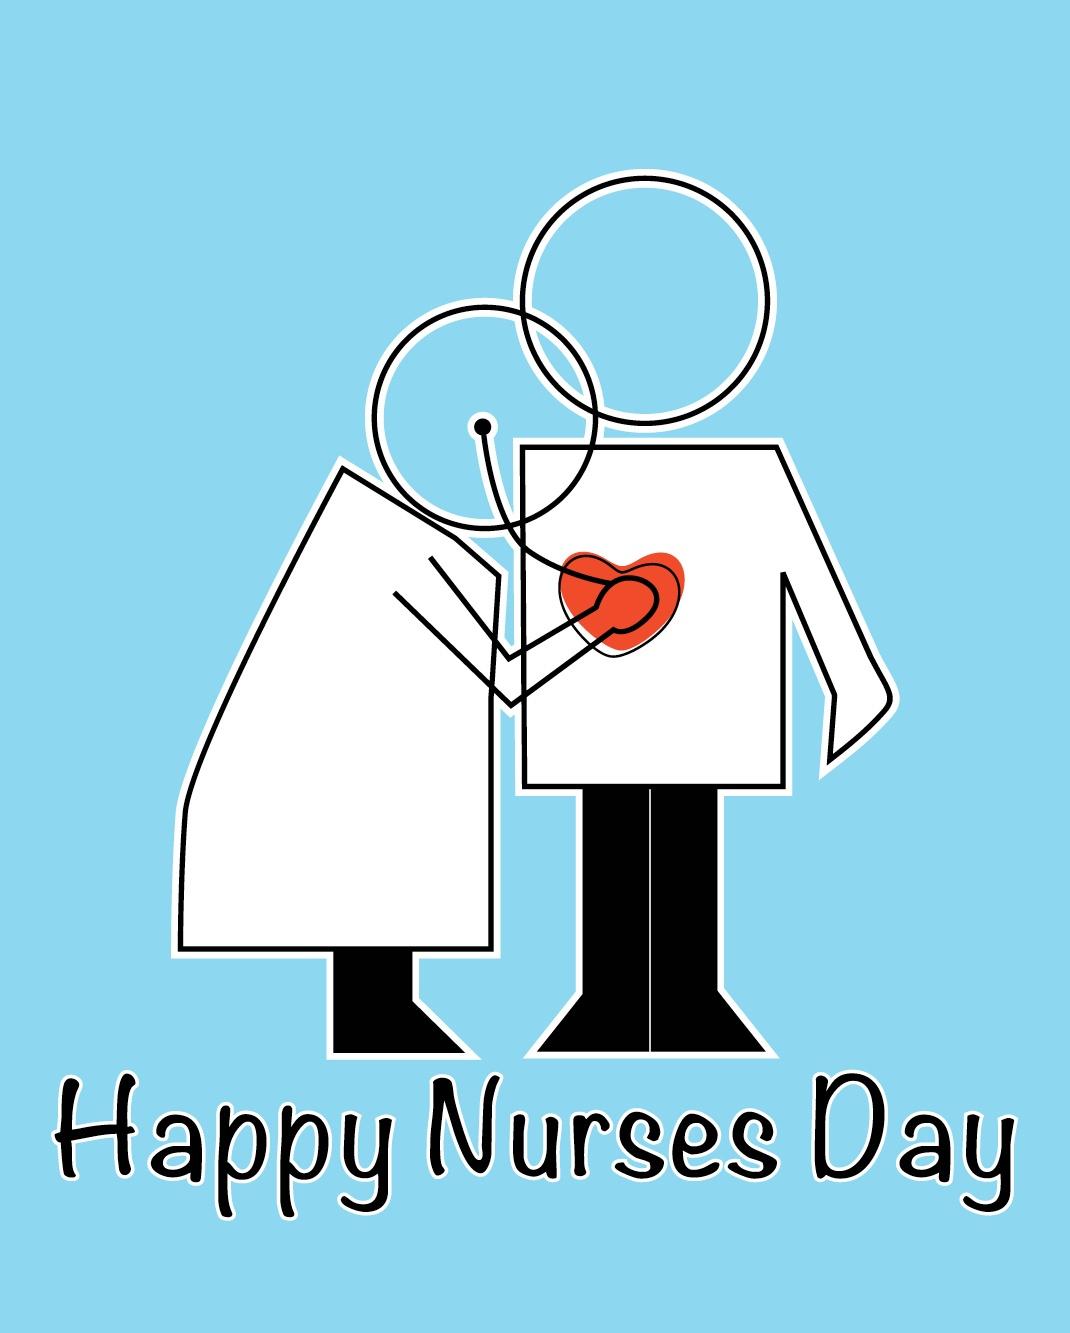 Happy Nurses Day | Pugsleyprints - Nurses Day Cards Free Printable